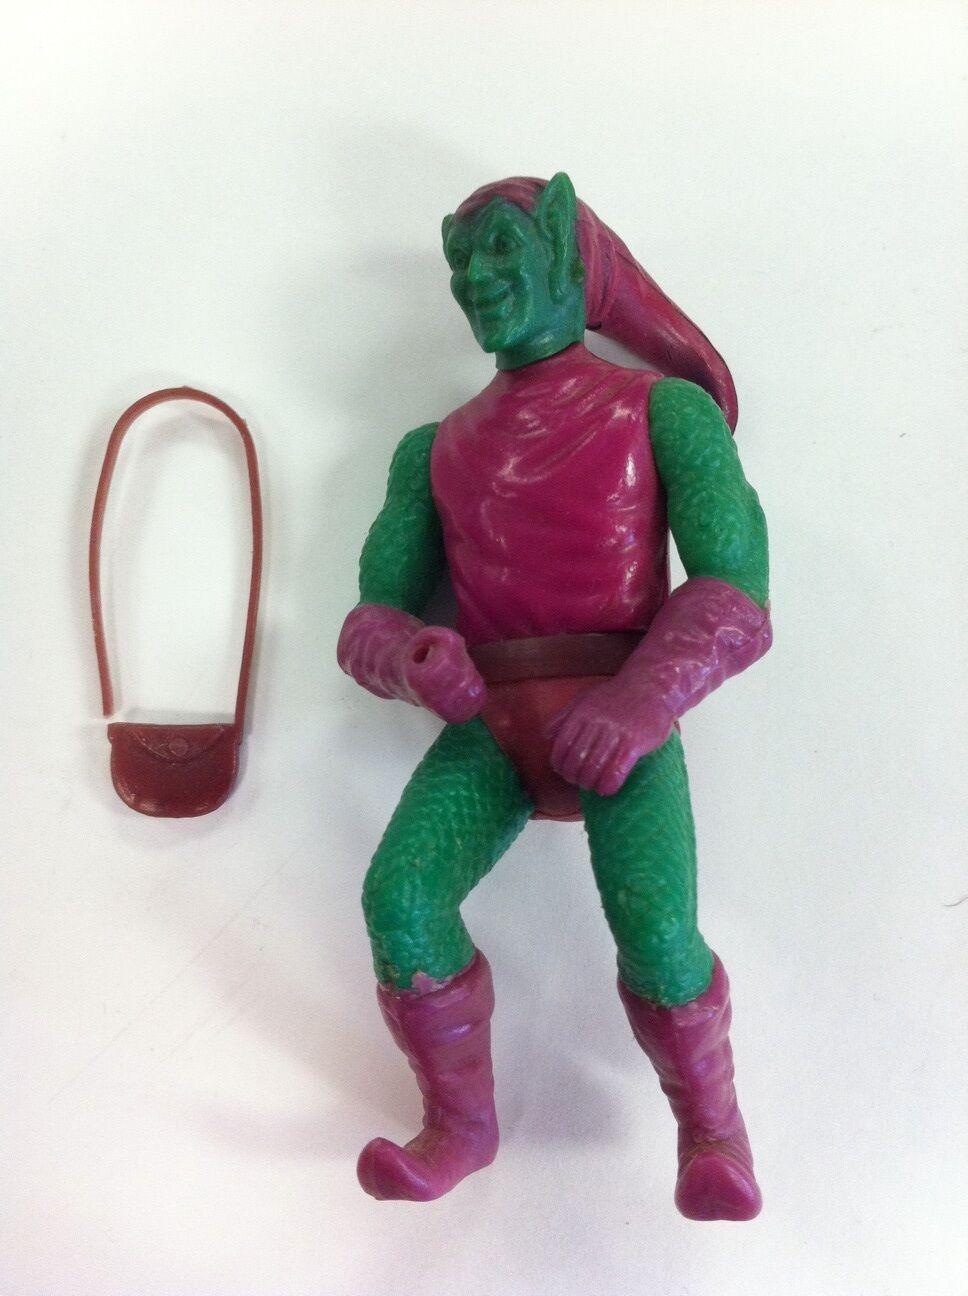 VINTAGE MEGO COMIC ACTION HEROES LOOSE verde GOBLIN 3 3/4 FIGURE WITH SATCHEL